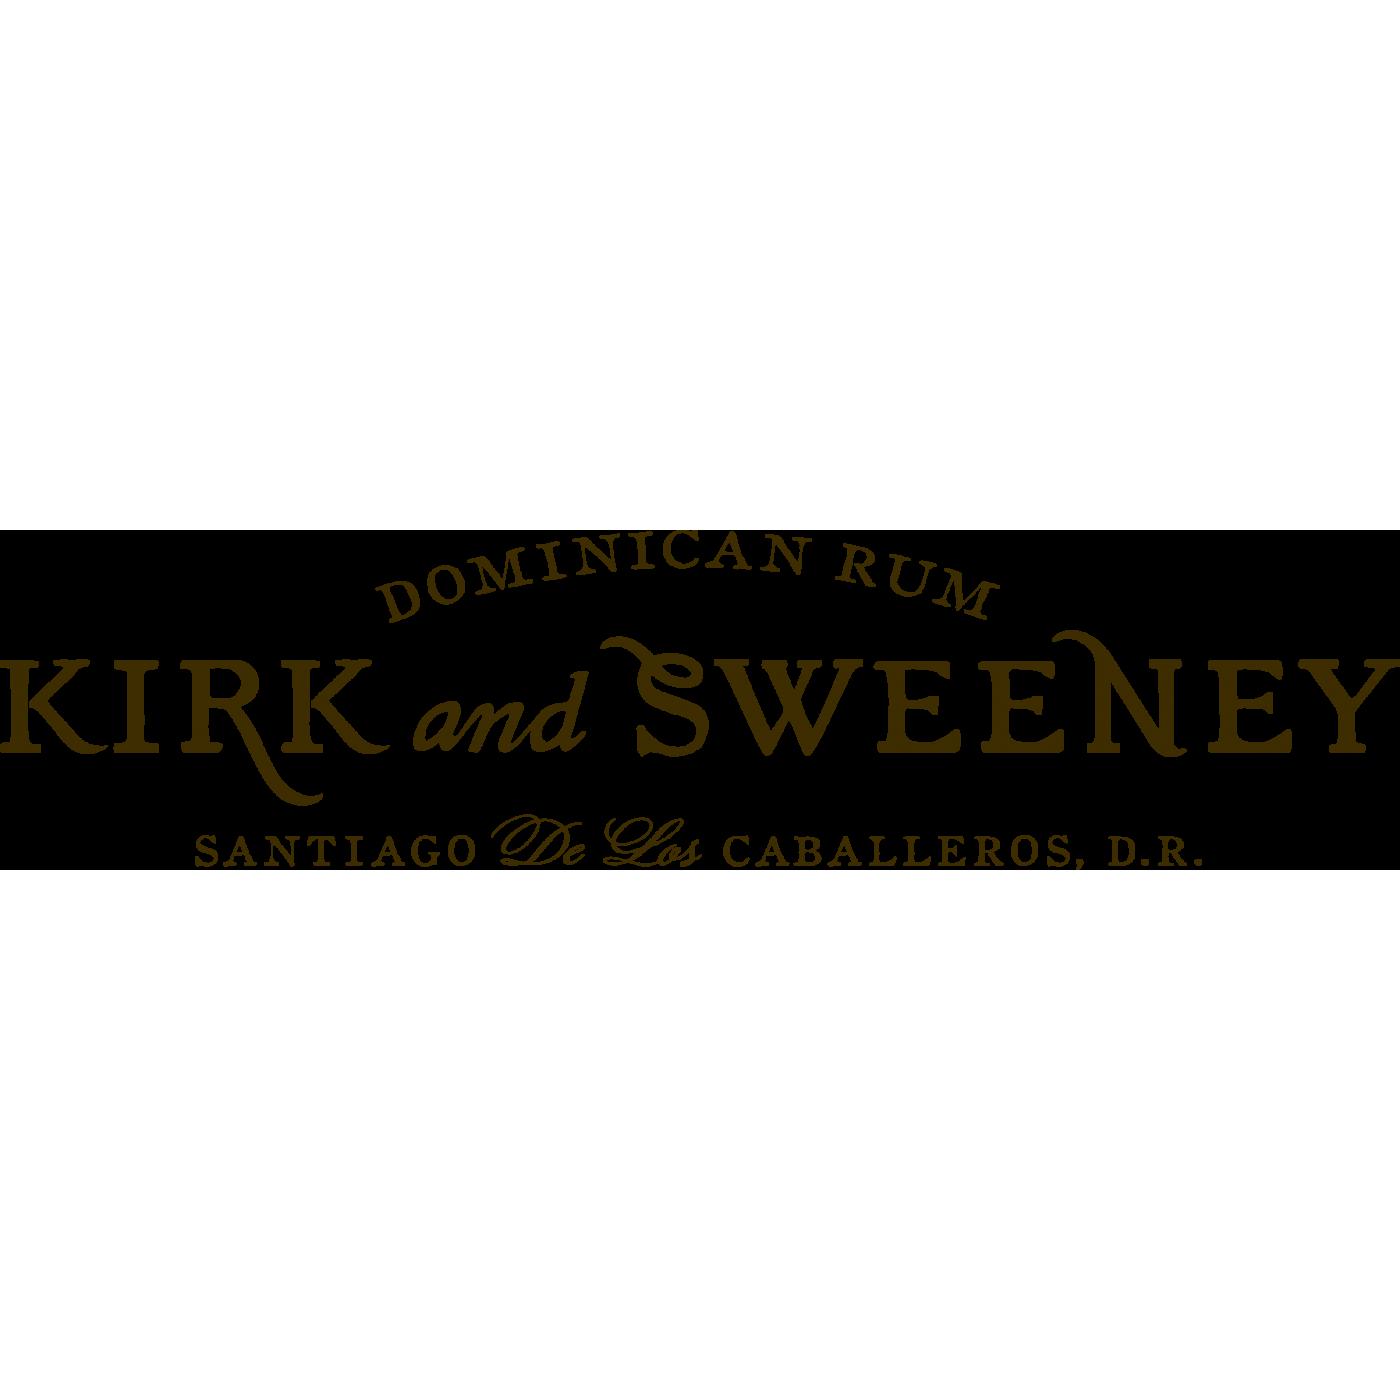 Kirk and Sweeney Rum.png